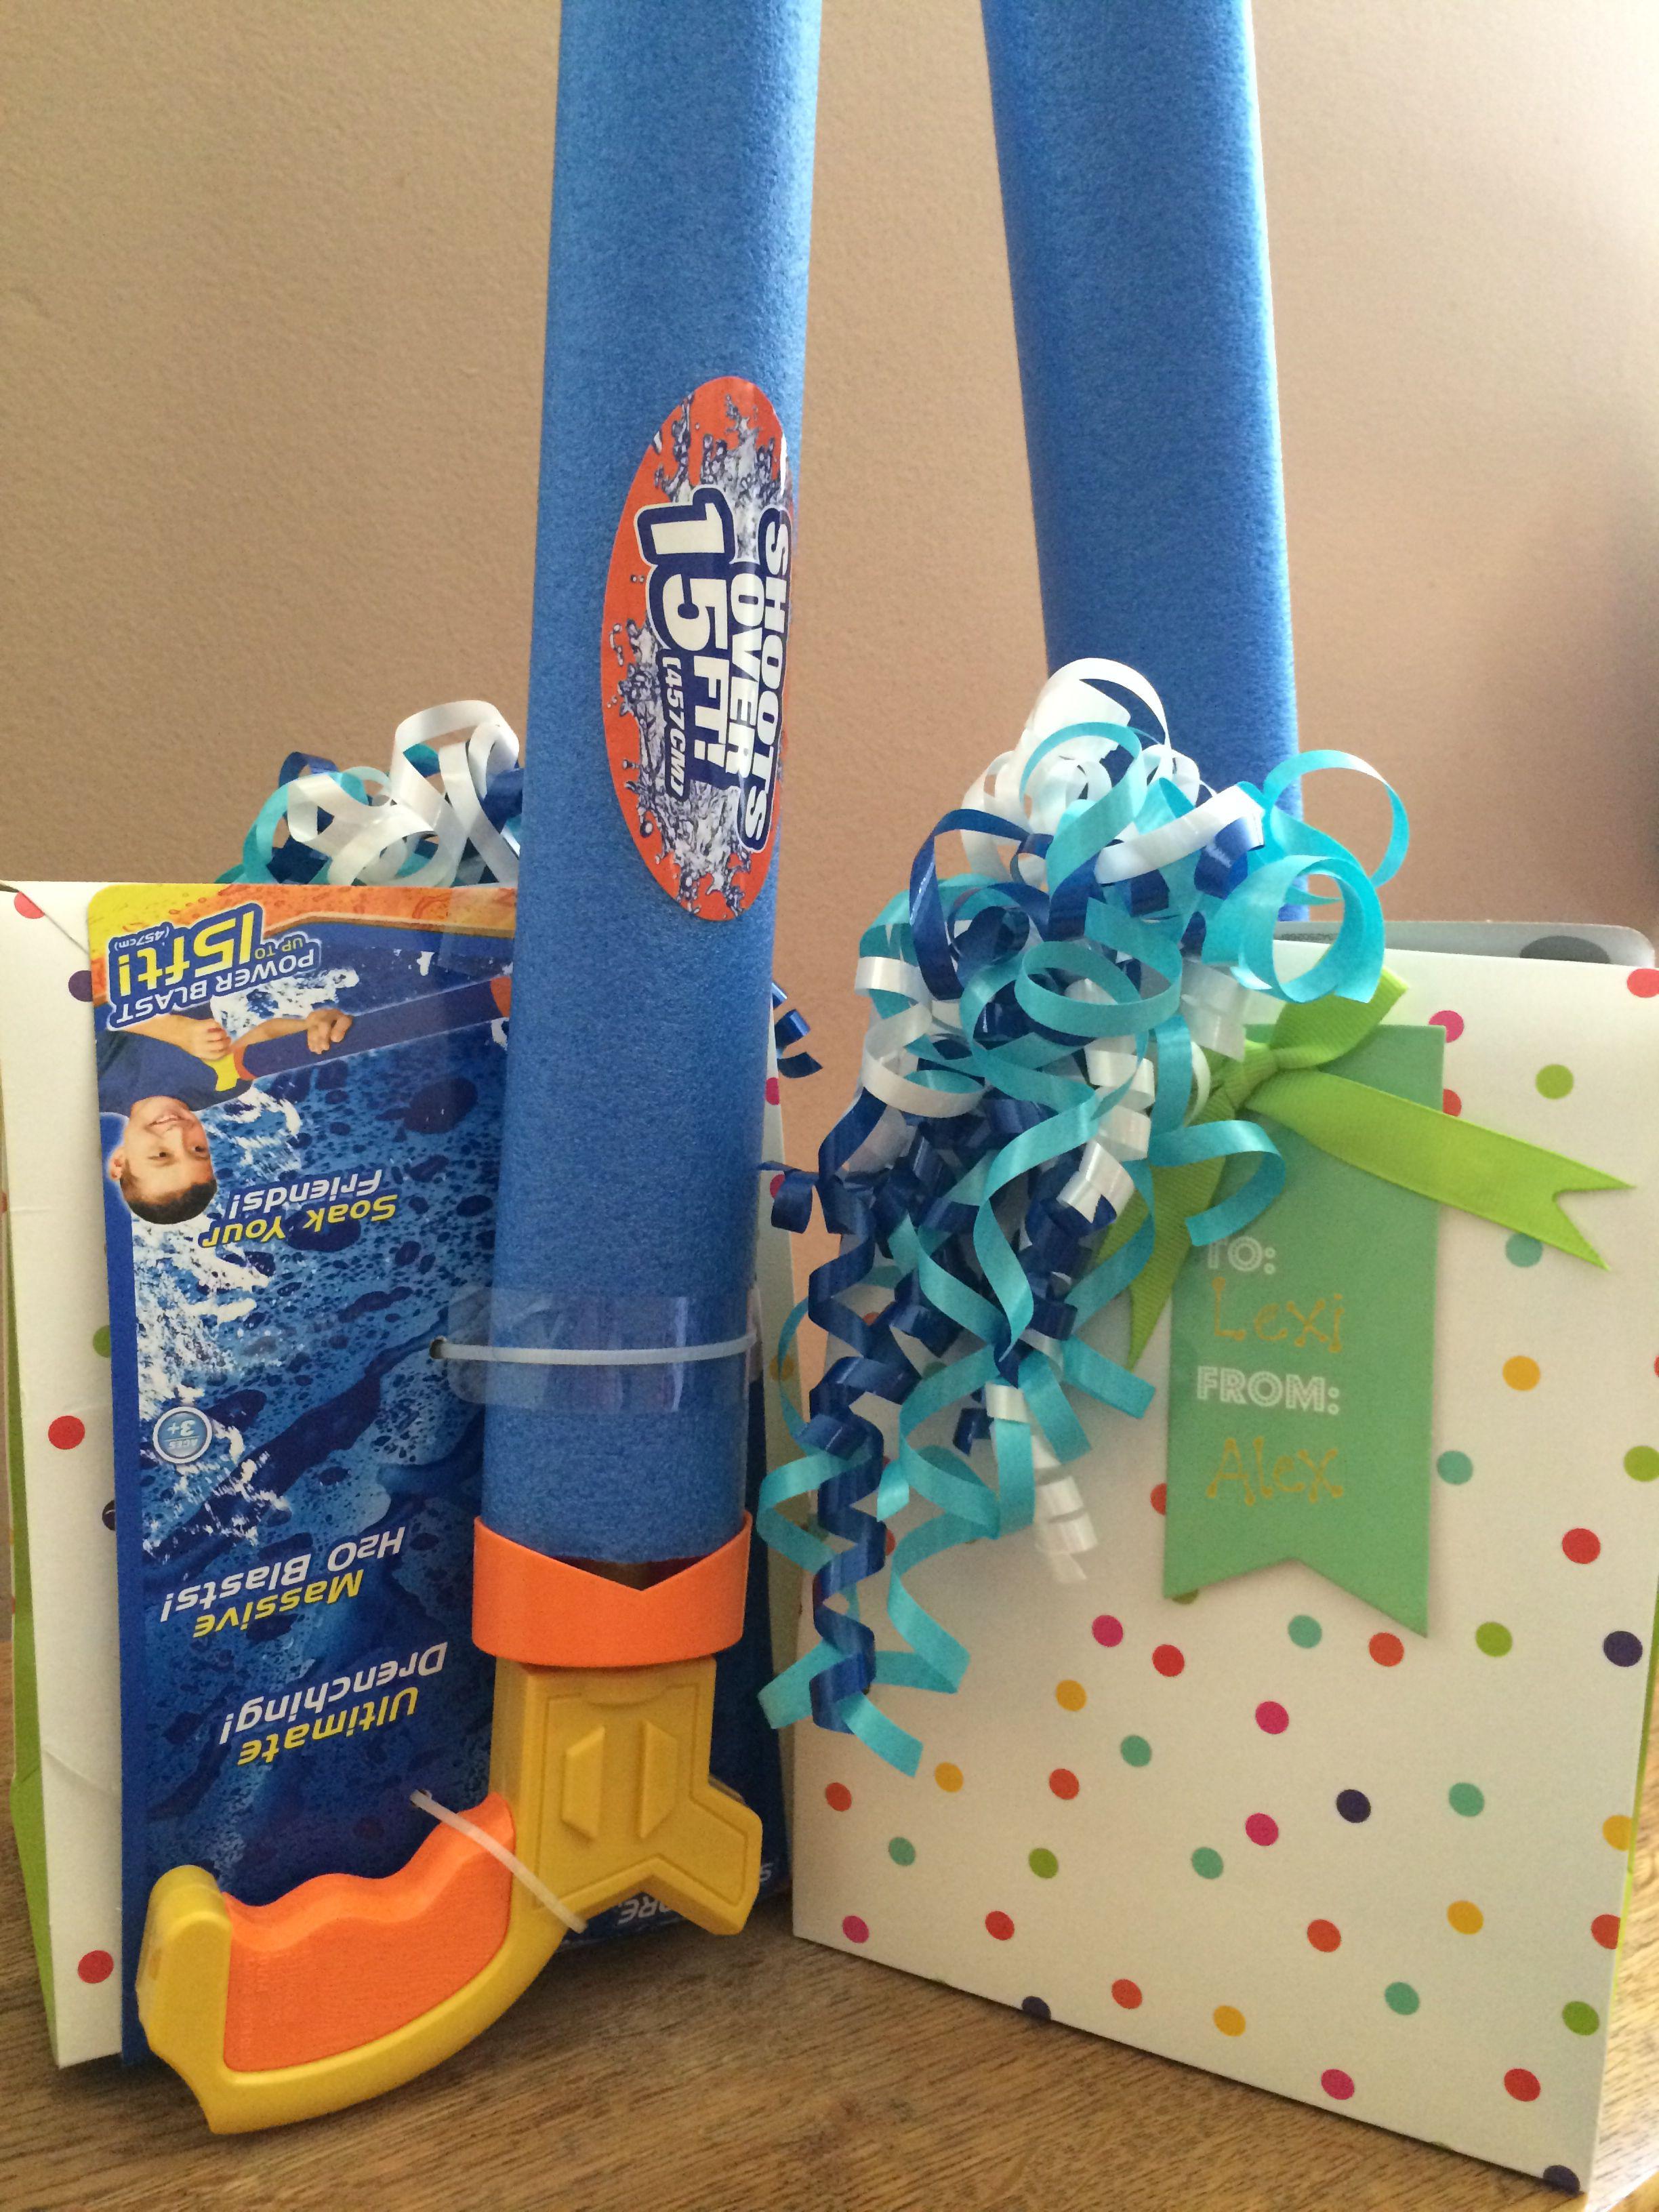 Birthday Gifts For Girlfriend Amazon 2021